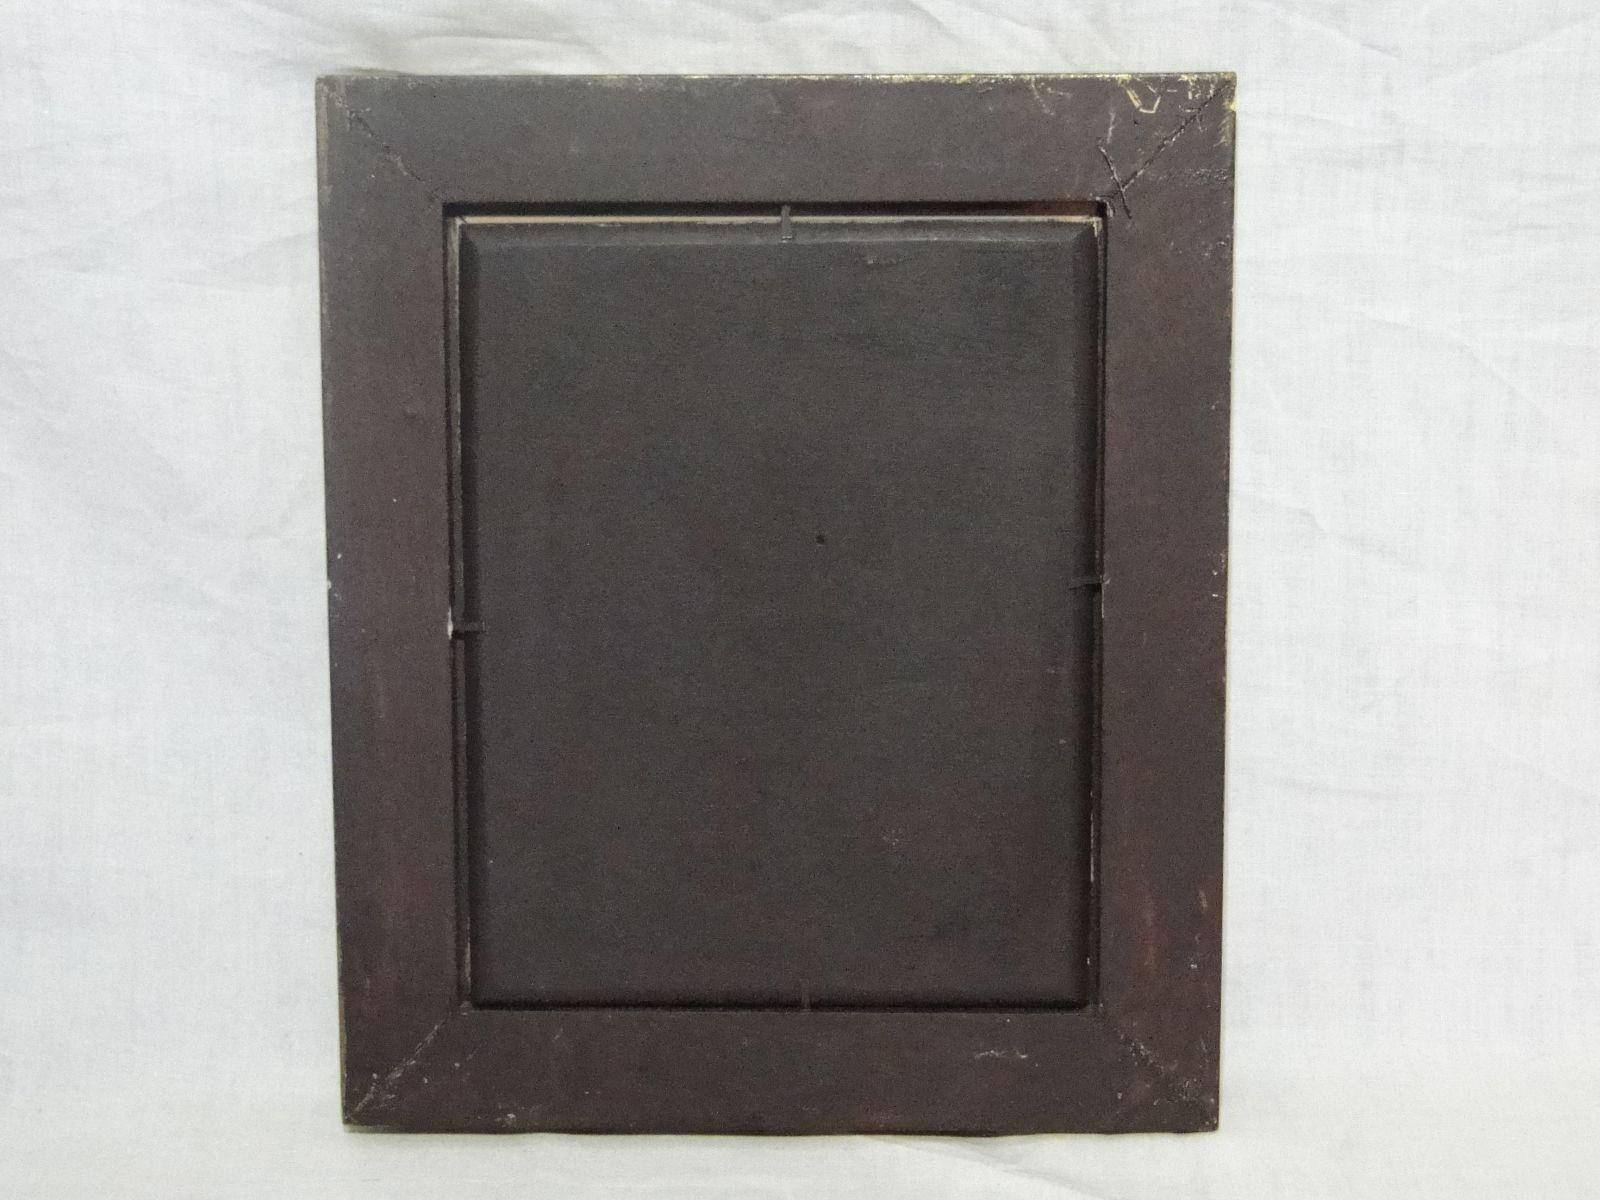 DSC06134.JPG (1600�1200)